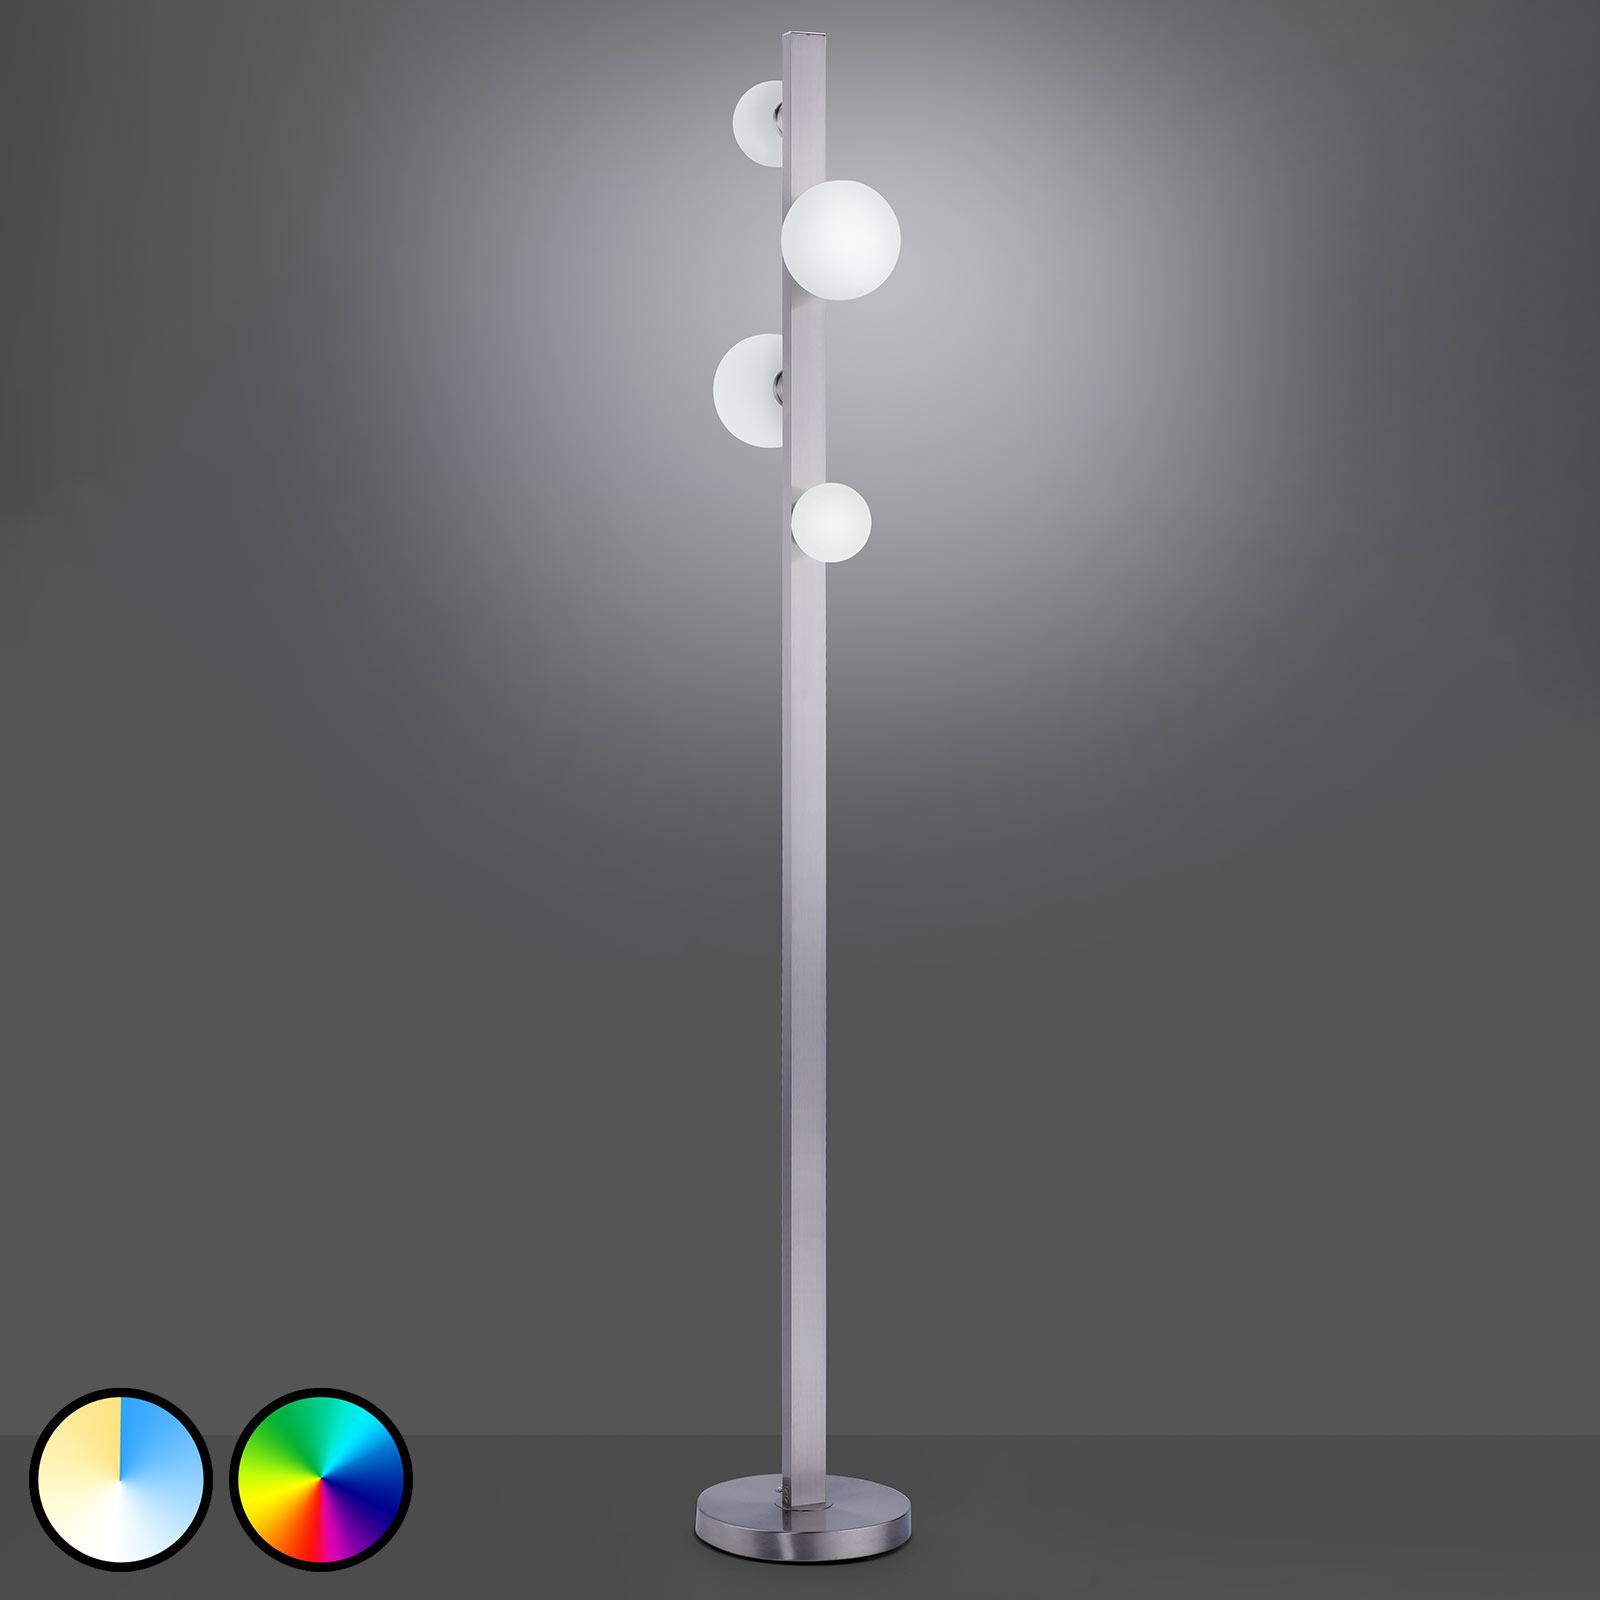 Trio WiZ Dicapo LED-Stehleuchte, vierflammig